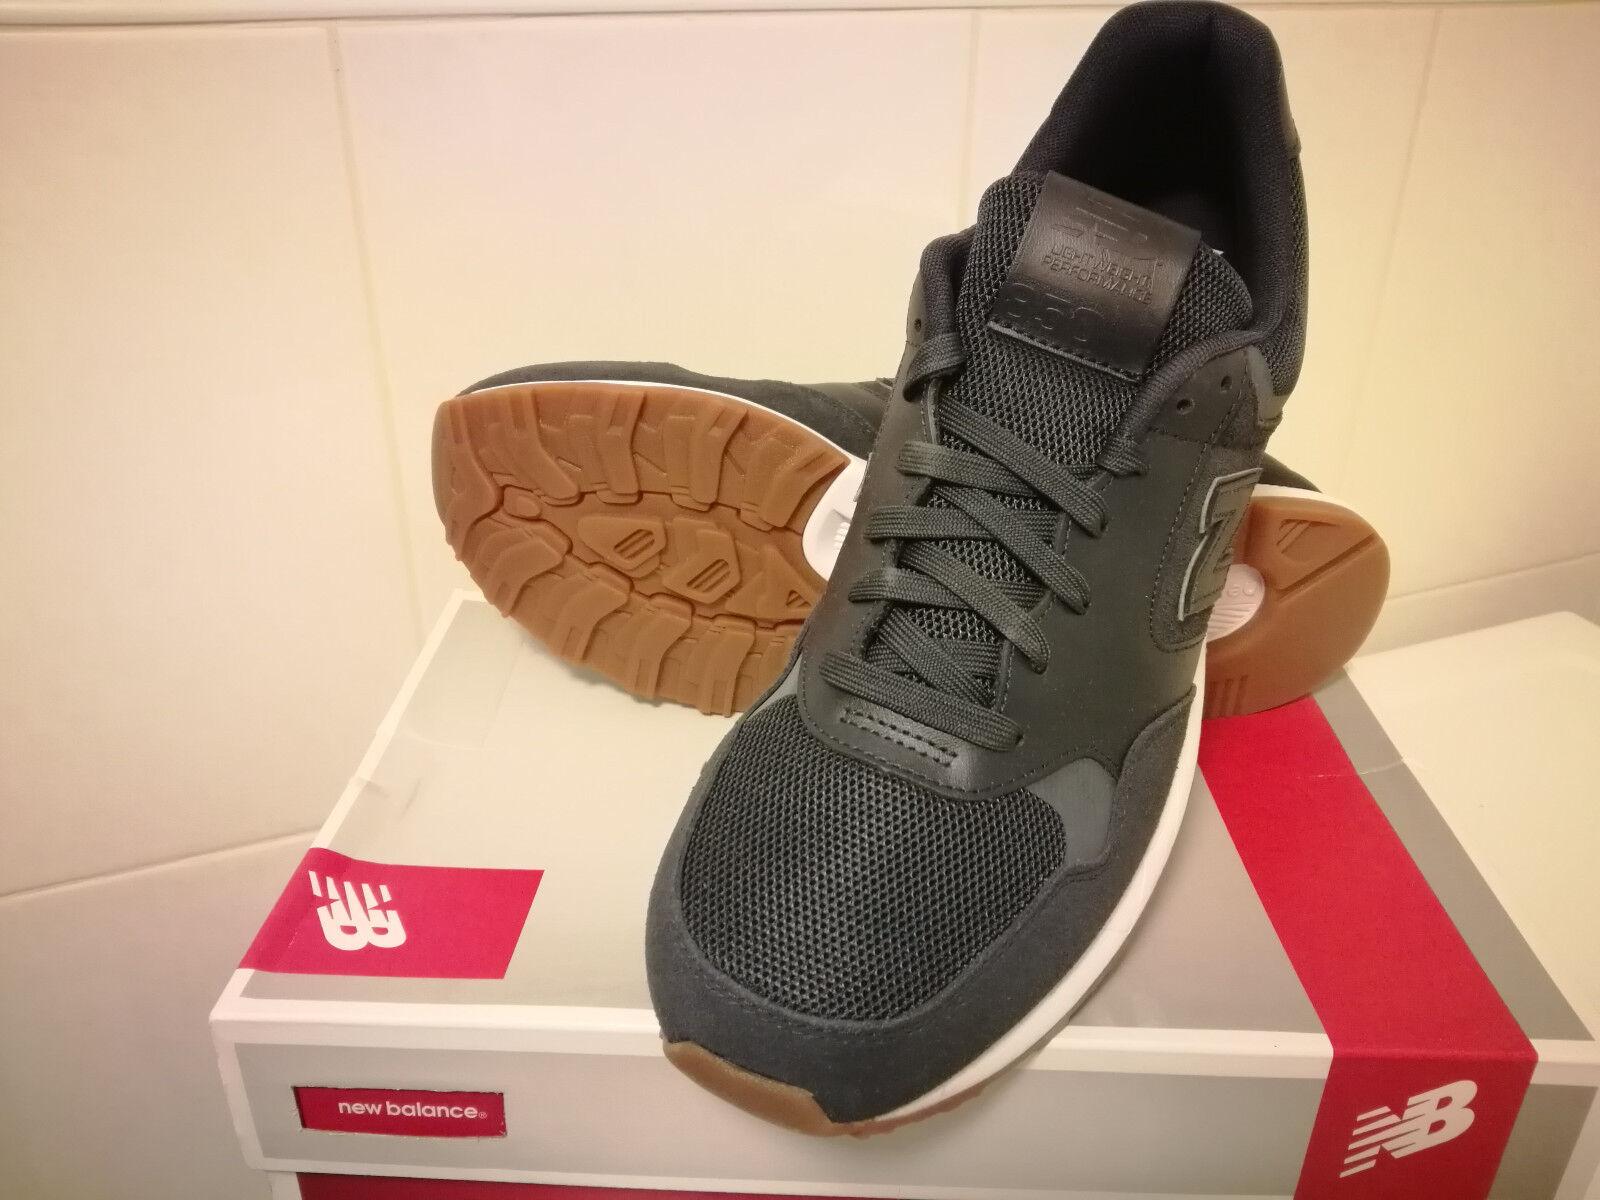 New! Uomo New Balance 850 90's remix Running  Shoes - limited sizes navy